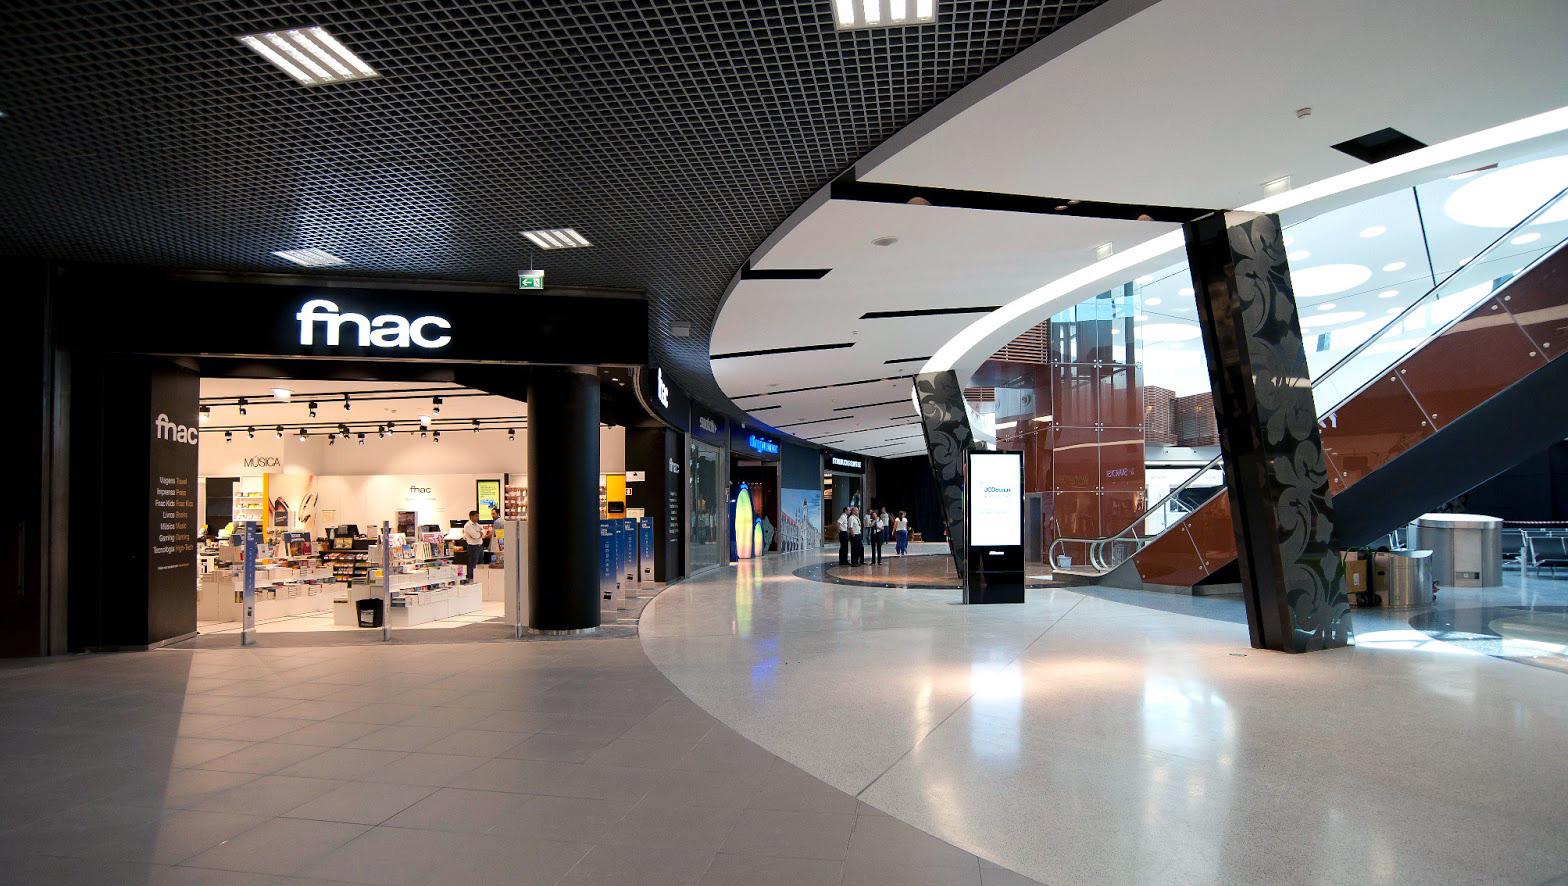 Fnac no Aeroporto de Lisboa